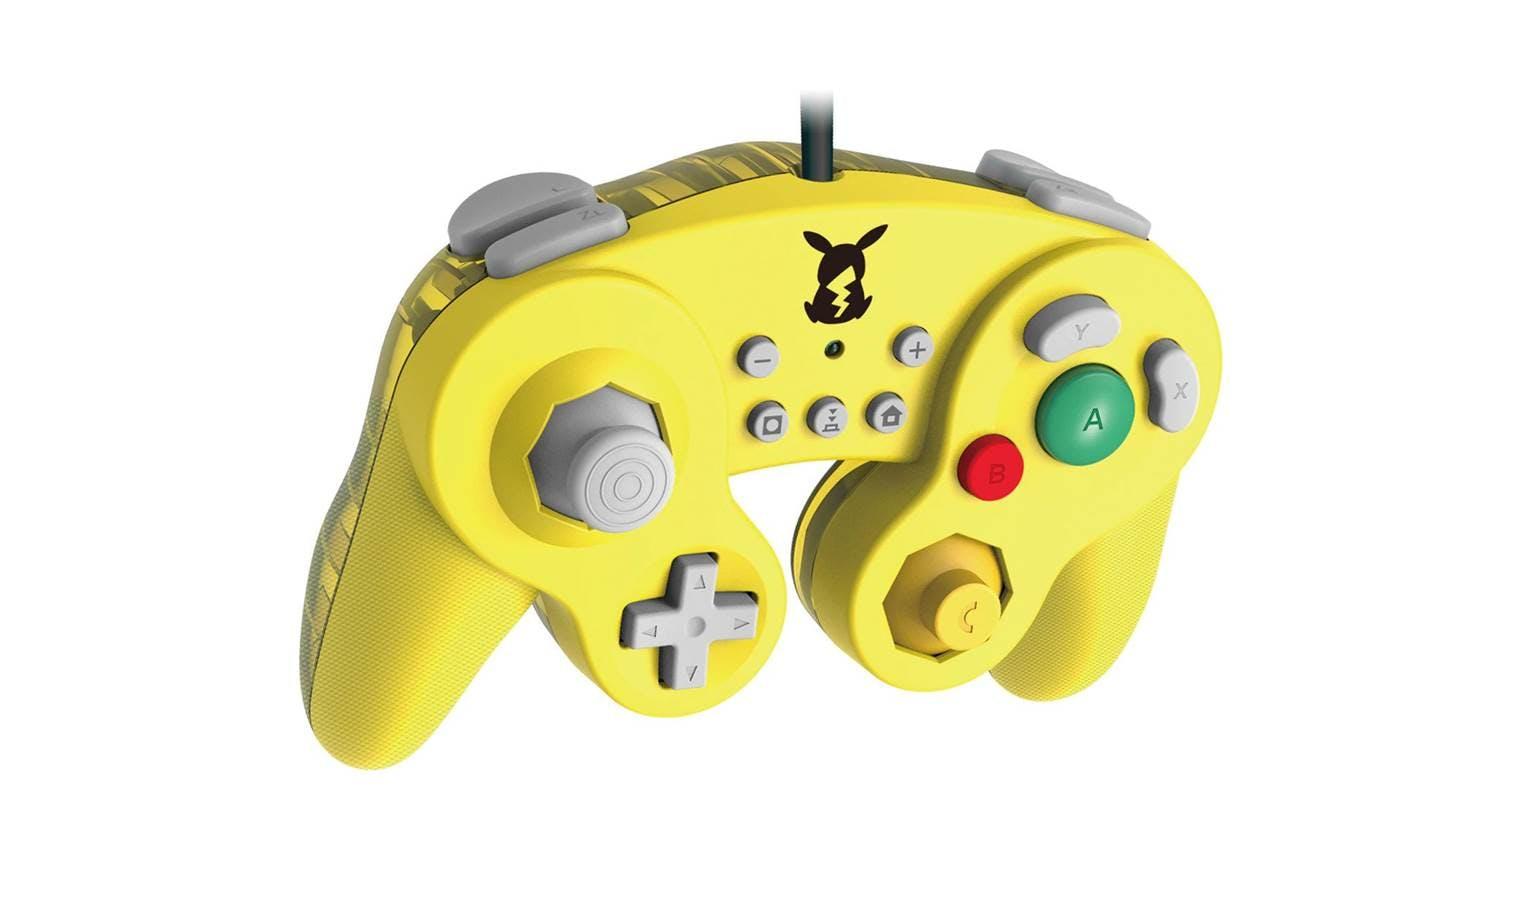 HORI Battle Pad GameCube Controller for Nintendo Switch - Pikachu